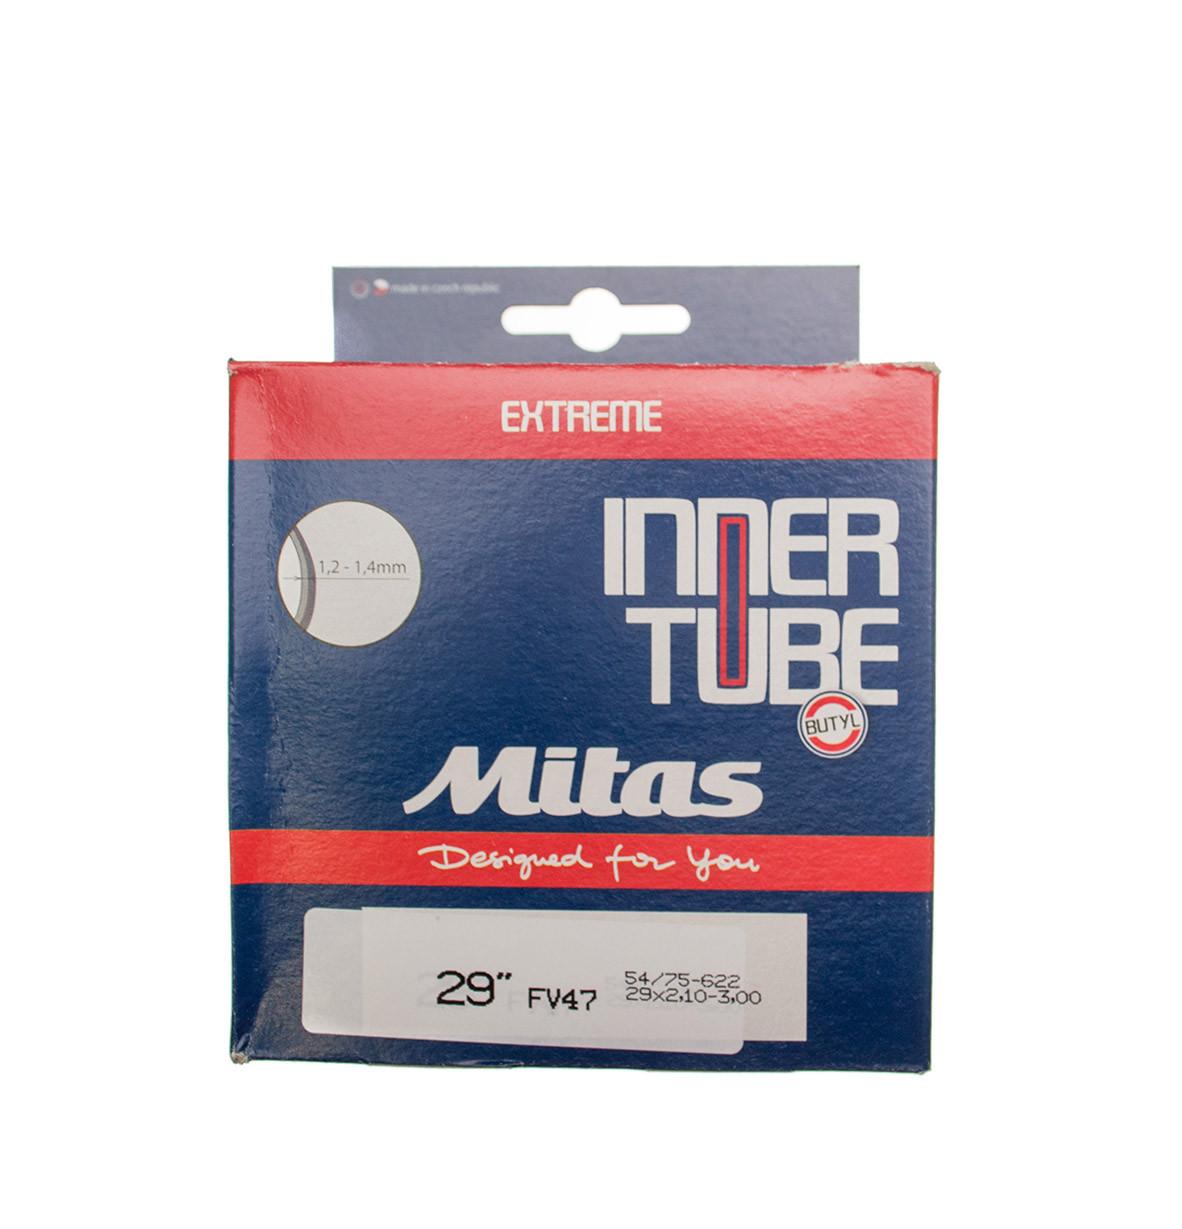 "Камера Mitas A11-X EXTREME SBC 28-29""x2.10-3.00"" (54/75x622) FV 47мм"